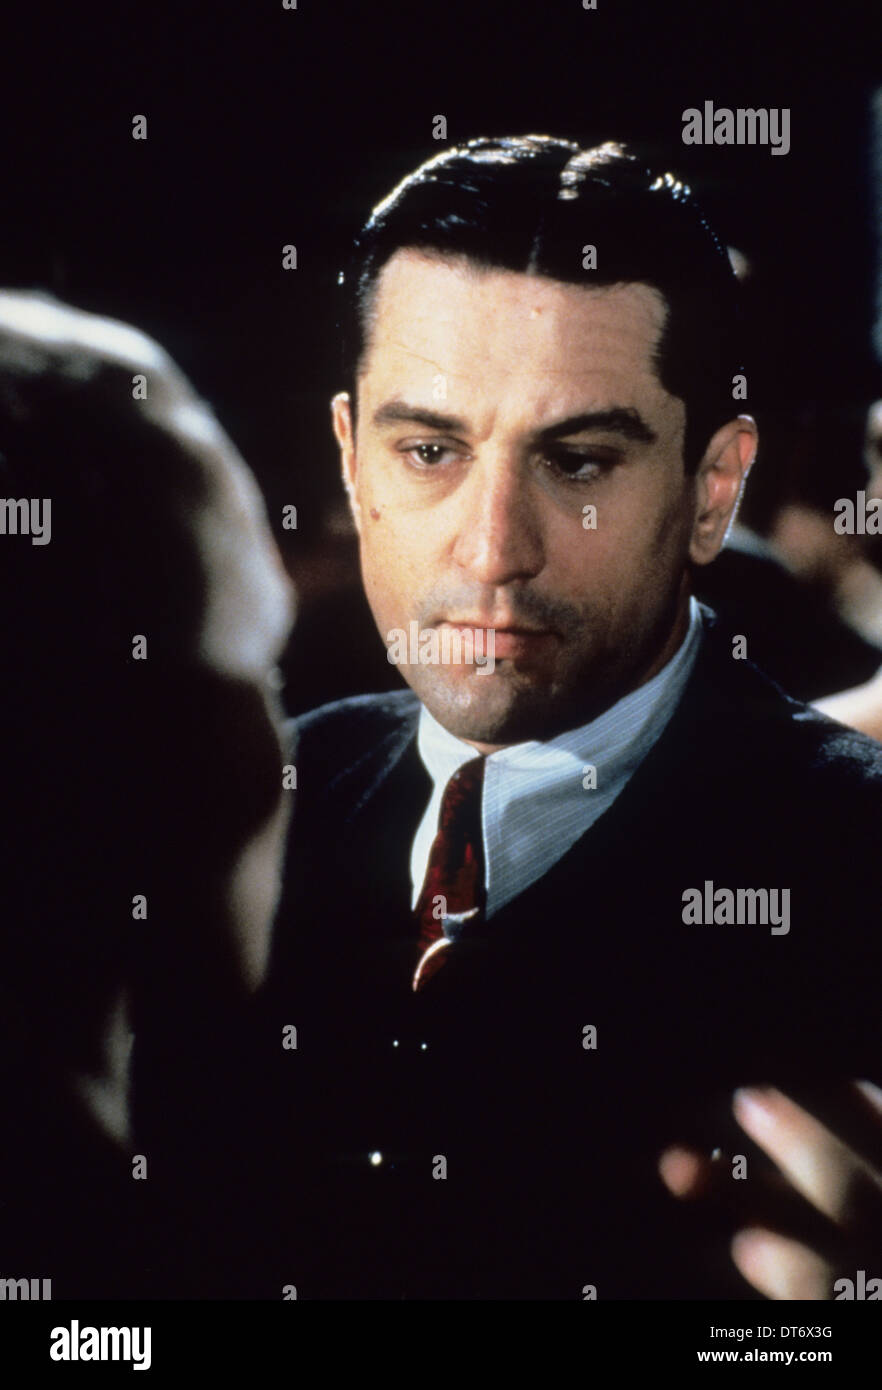 Robert De Niro Der Pate Teil Ii 1974 Stockfoto Bild 66535044 Alamy